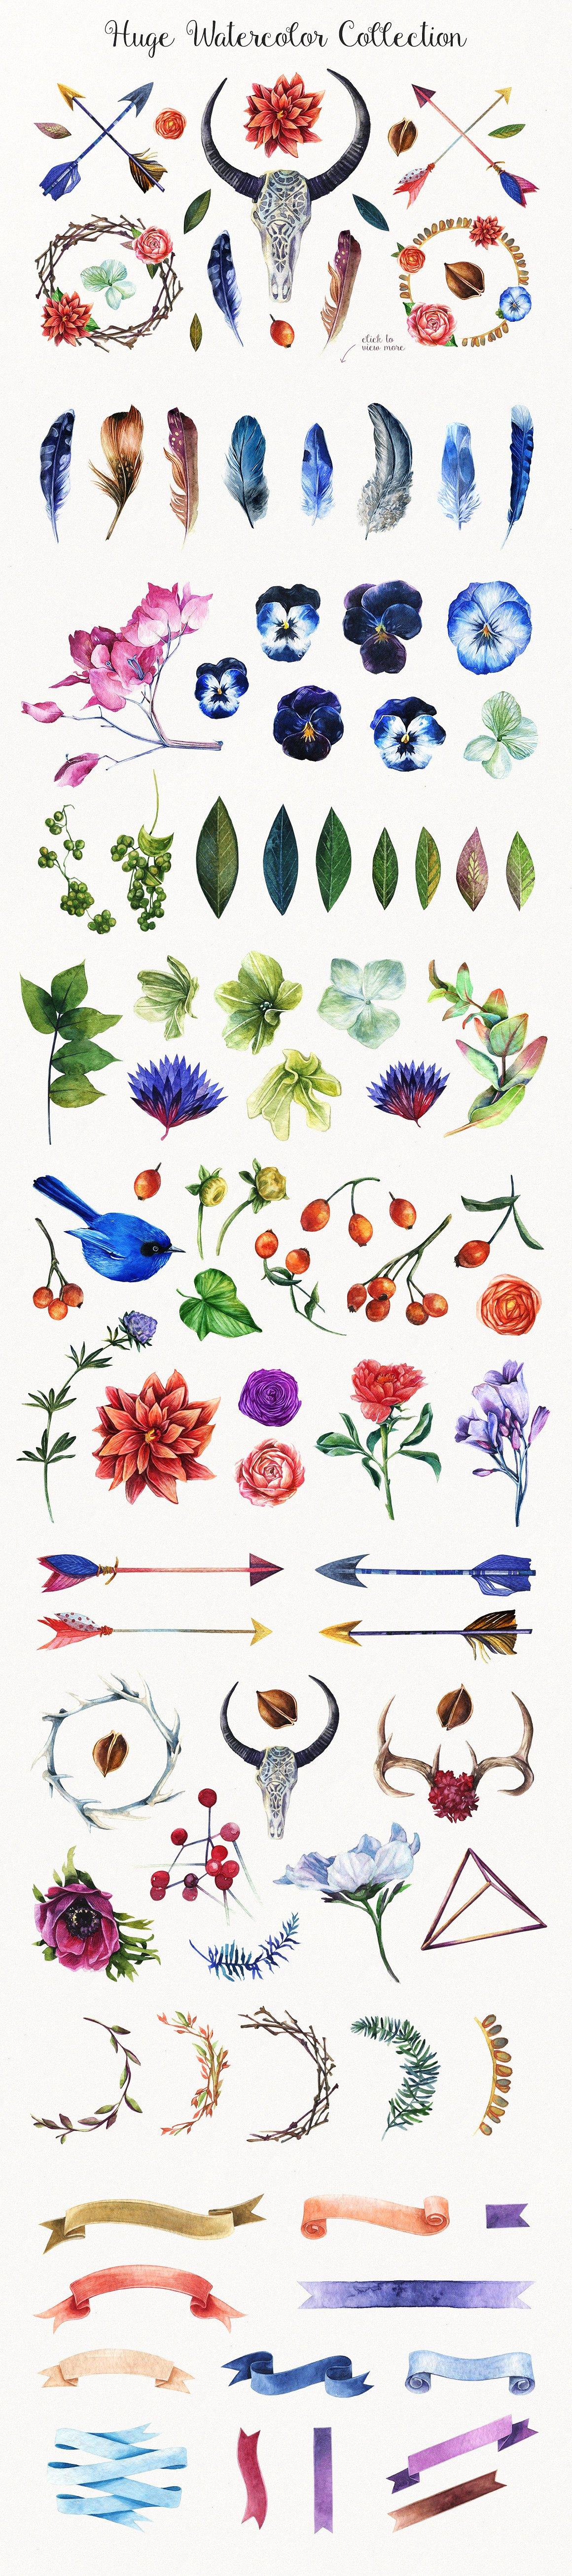 Enchanted Watercolor Kit2